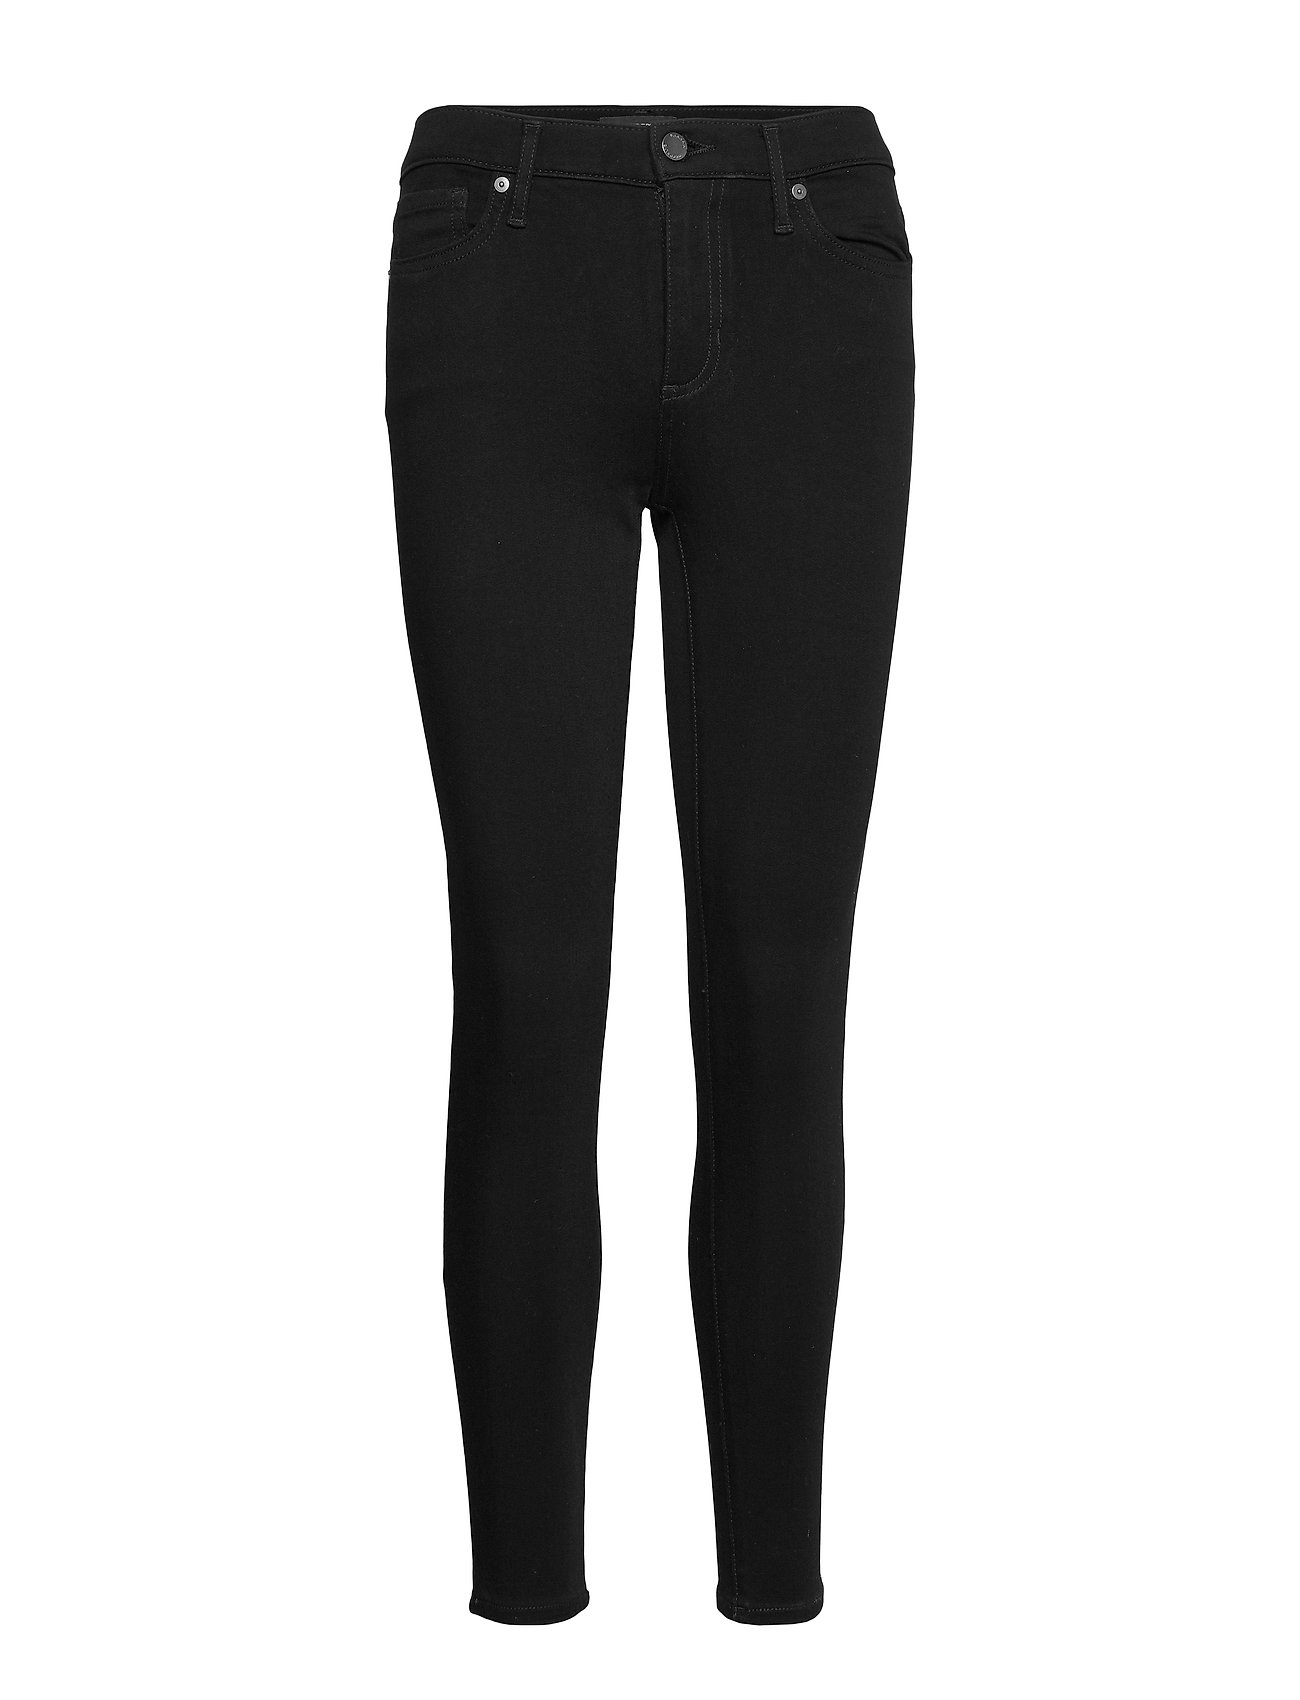 Banana Republic Mid-Rise Skinny Fade-Resistant Ankle Jean - BLACK K-100